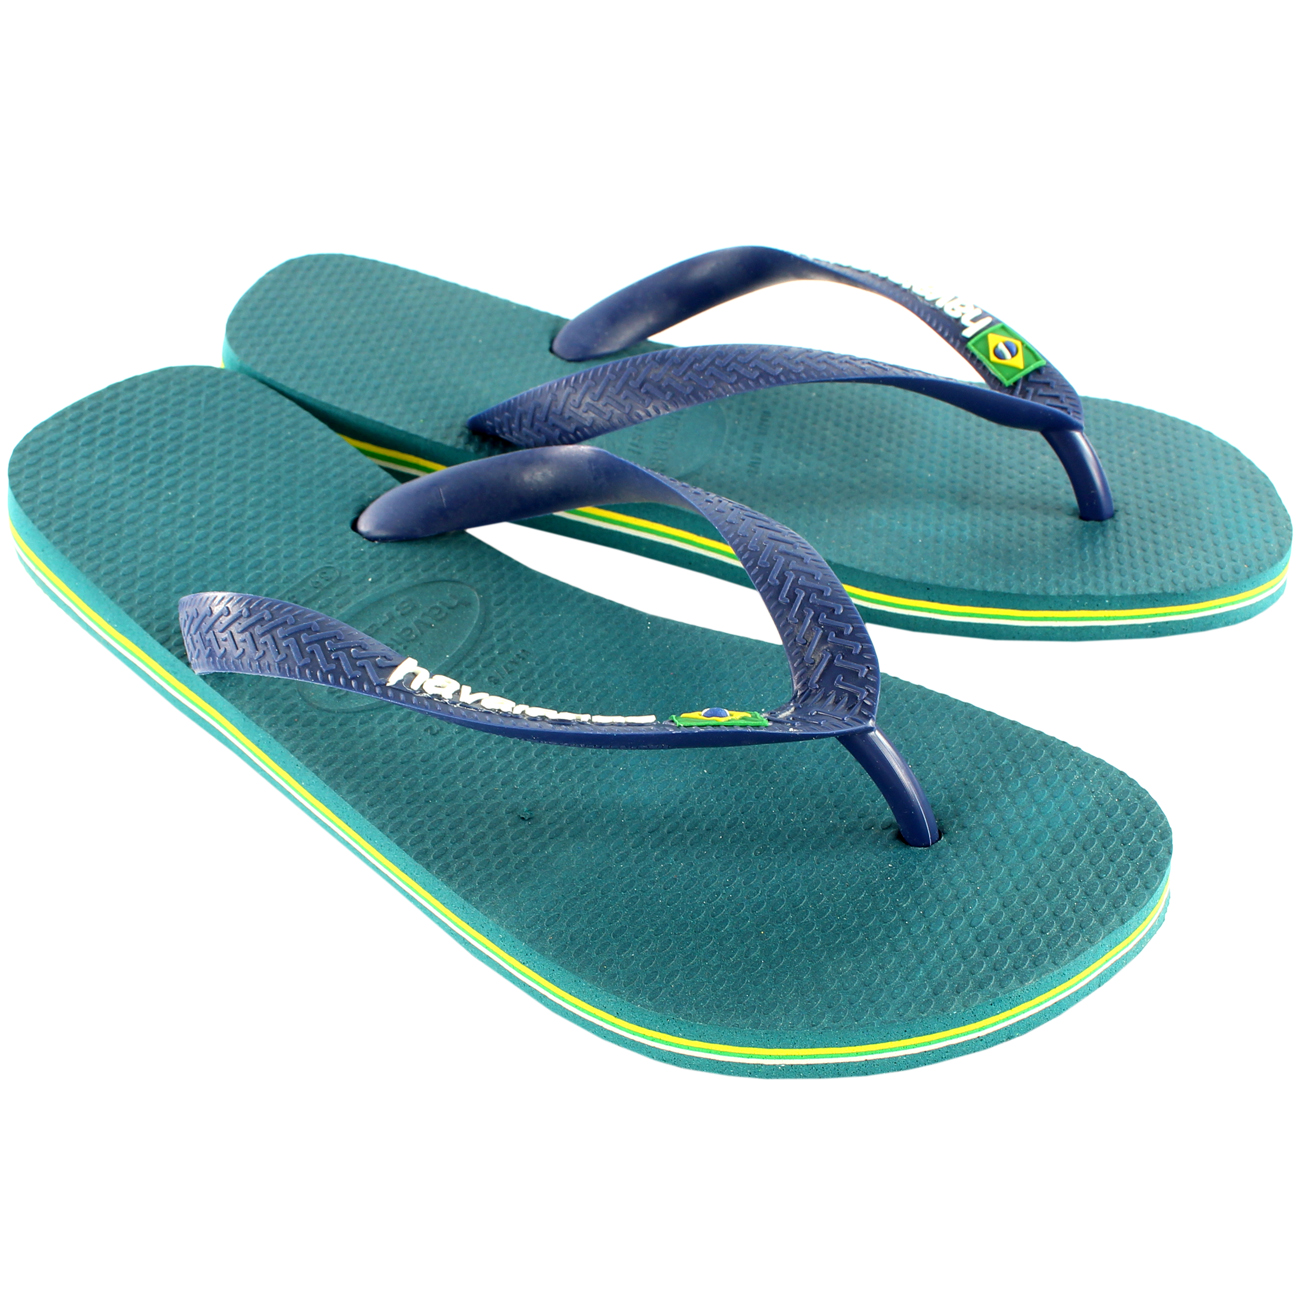 Mens Havaianas Brasil Logo Sandal Holiday Flip Flops Slip On Flats New All Sizes